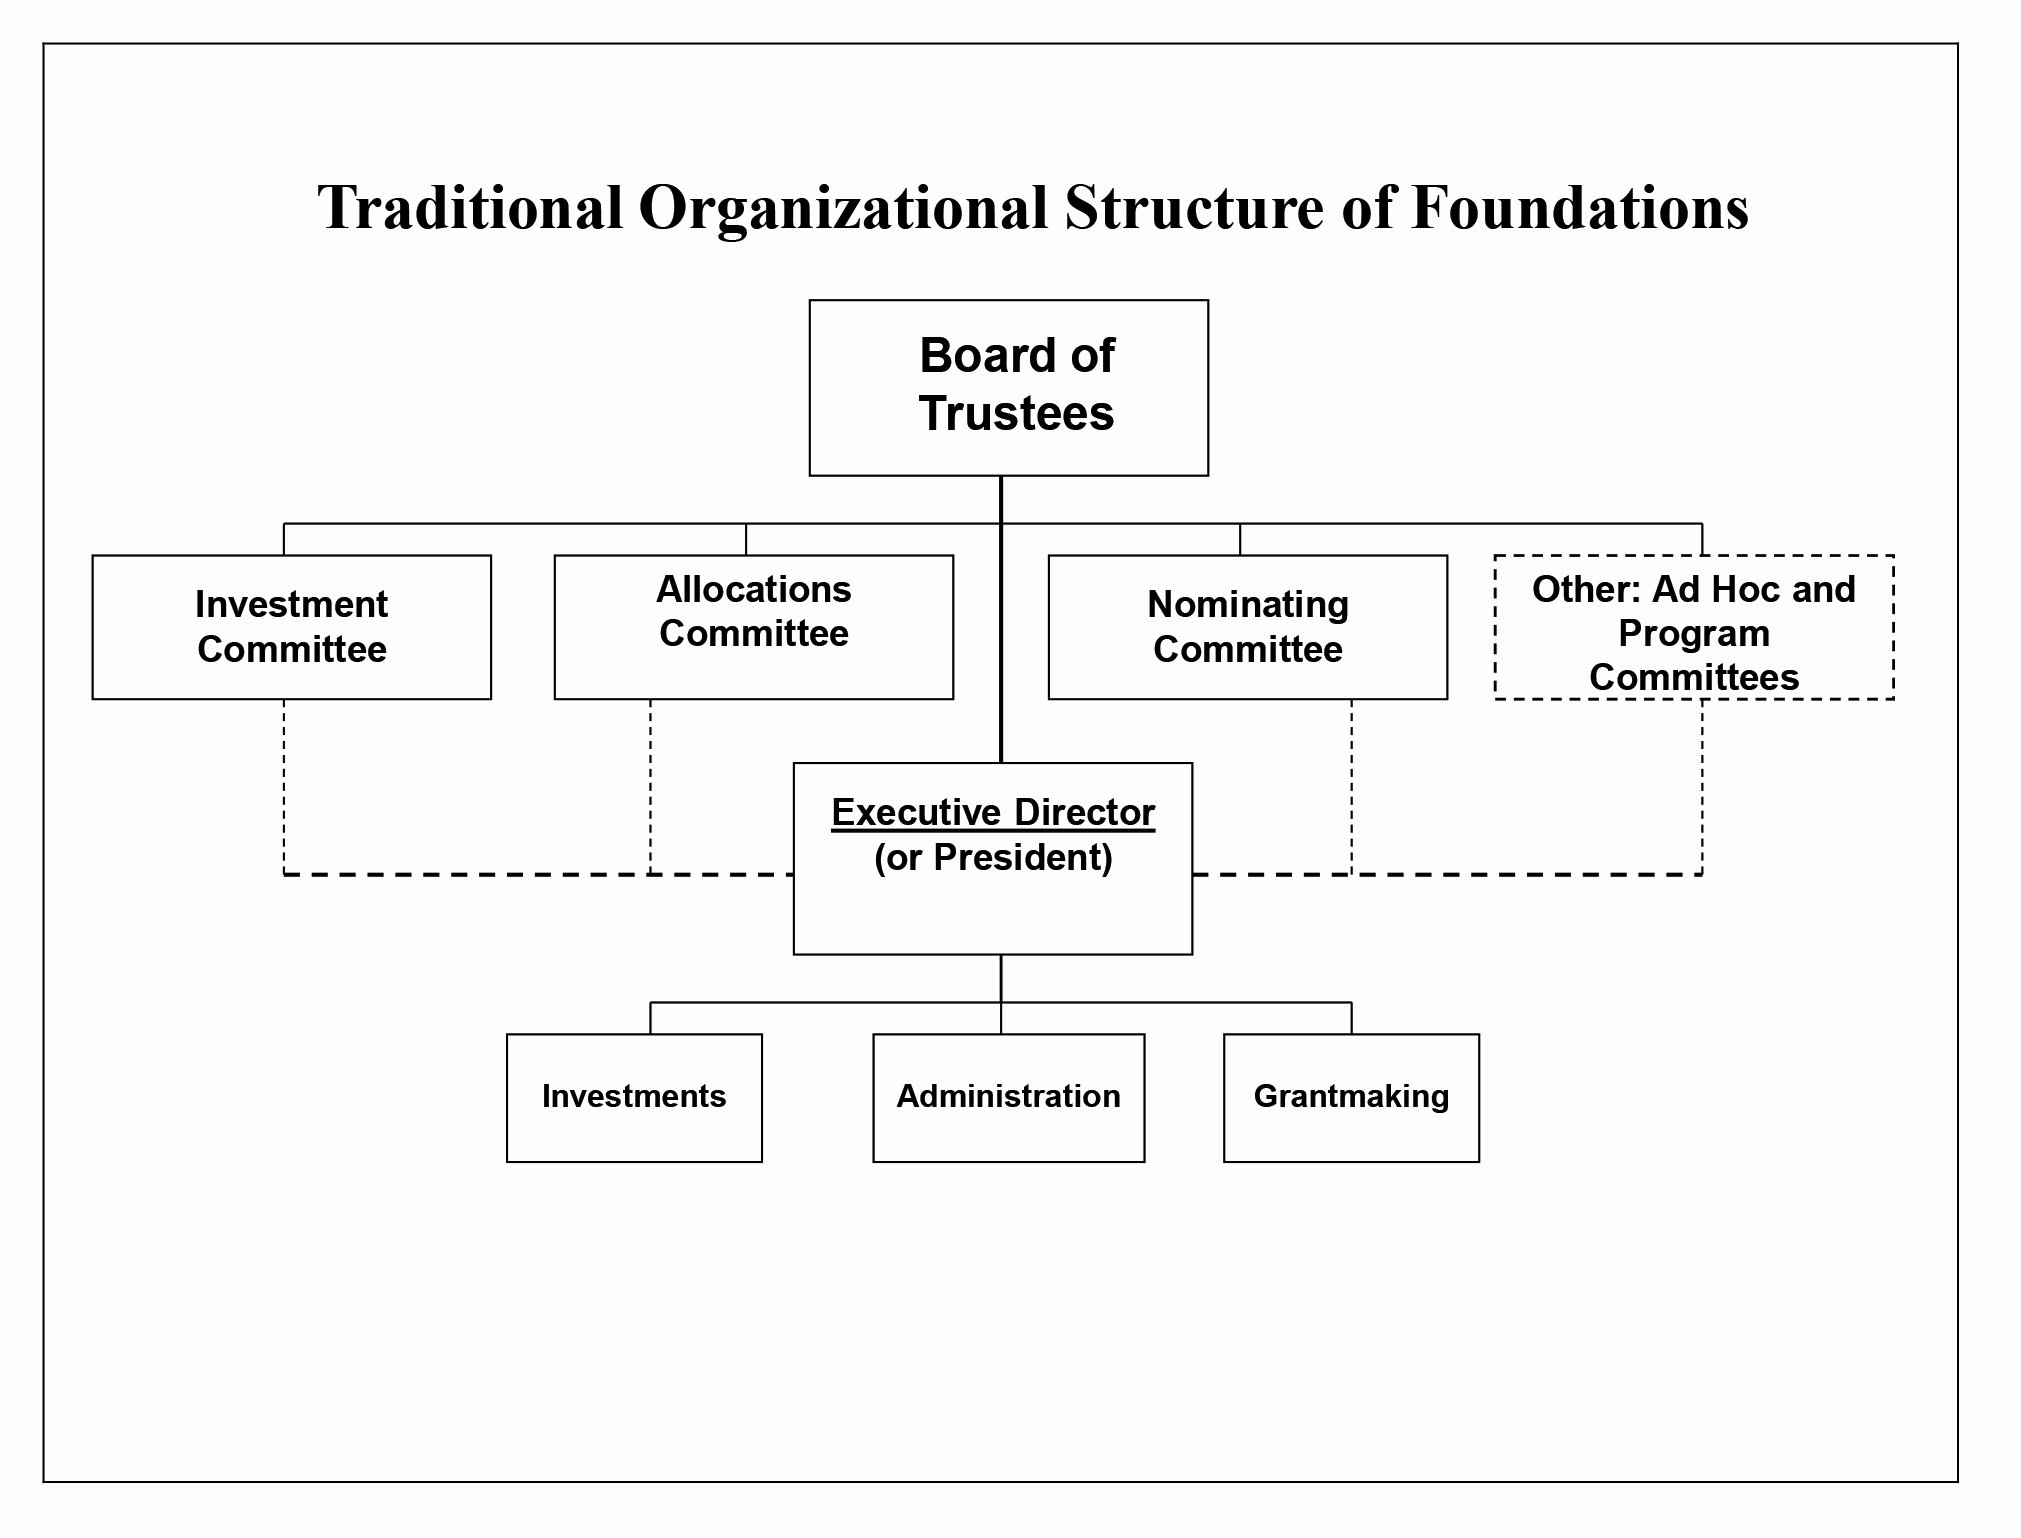 Non Profit organization Structure Template Unique Foundation Structure Traditional organizational Structure